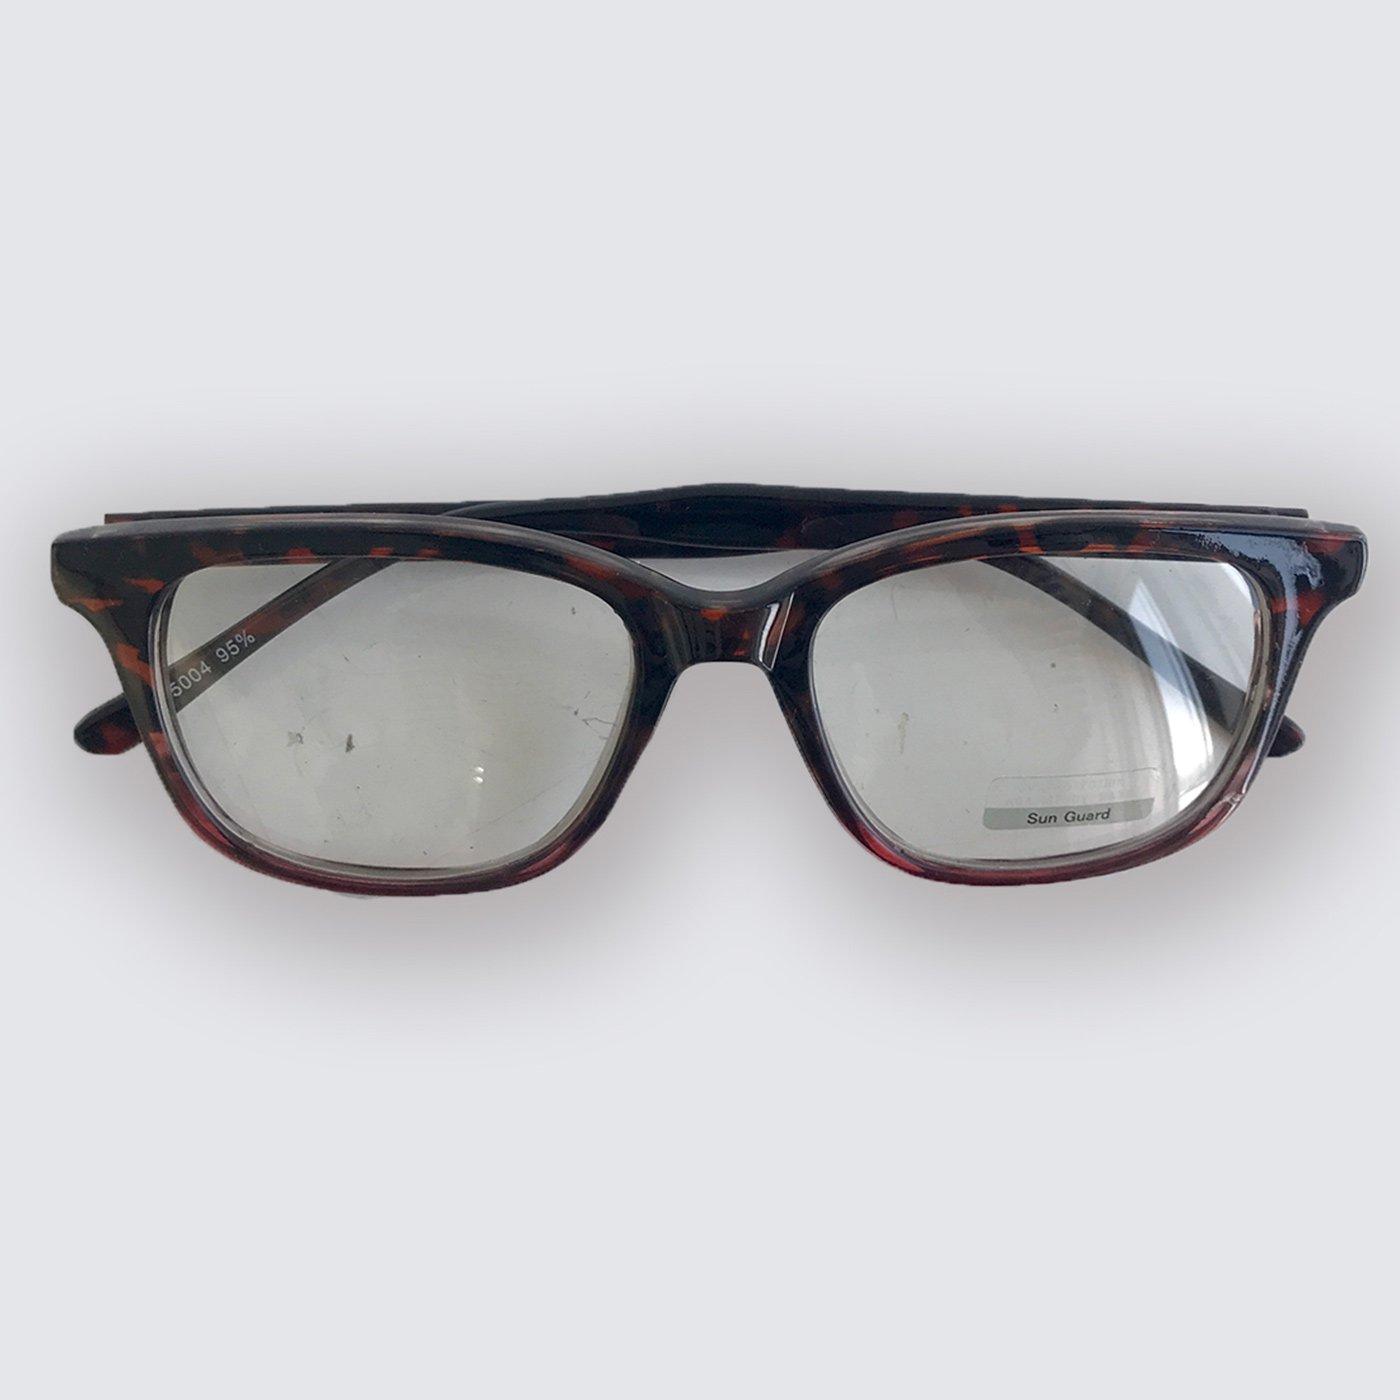 IEDIT[イディット] SELECT べっこう調フレームのクリアファッション用グラス〈デミ×ピンク〉